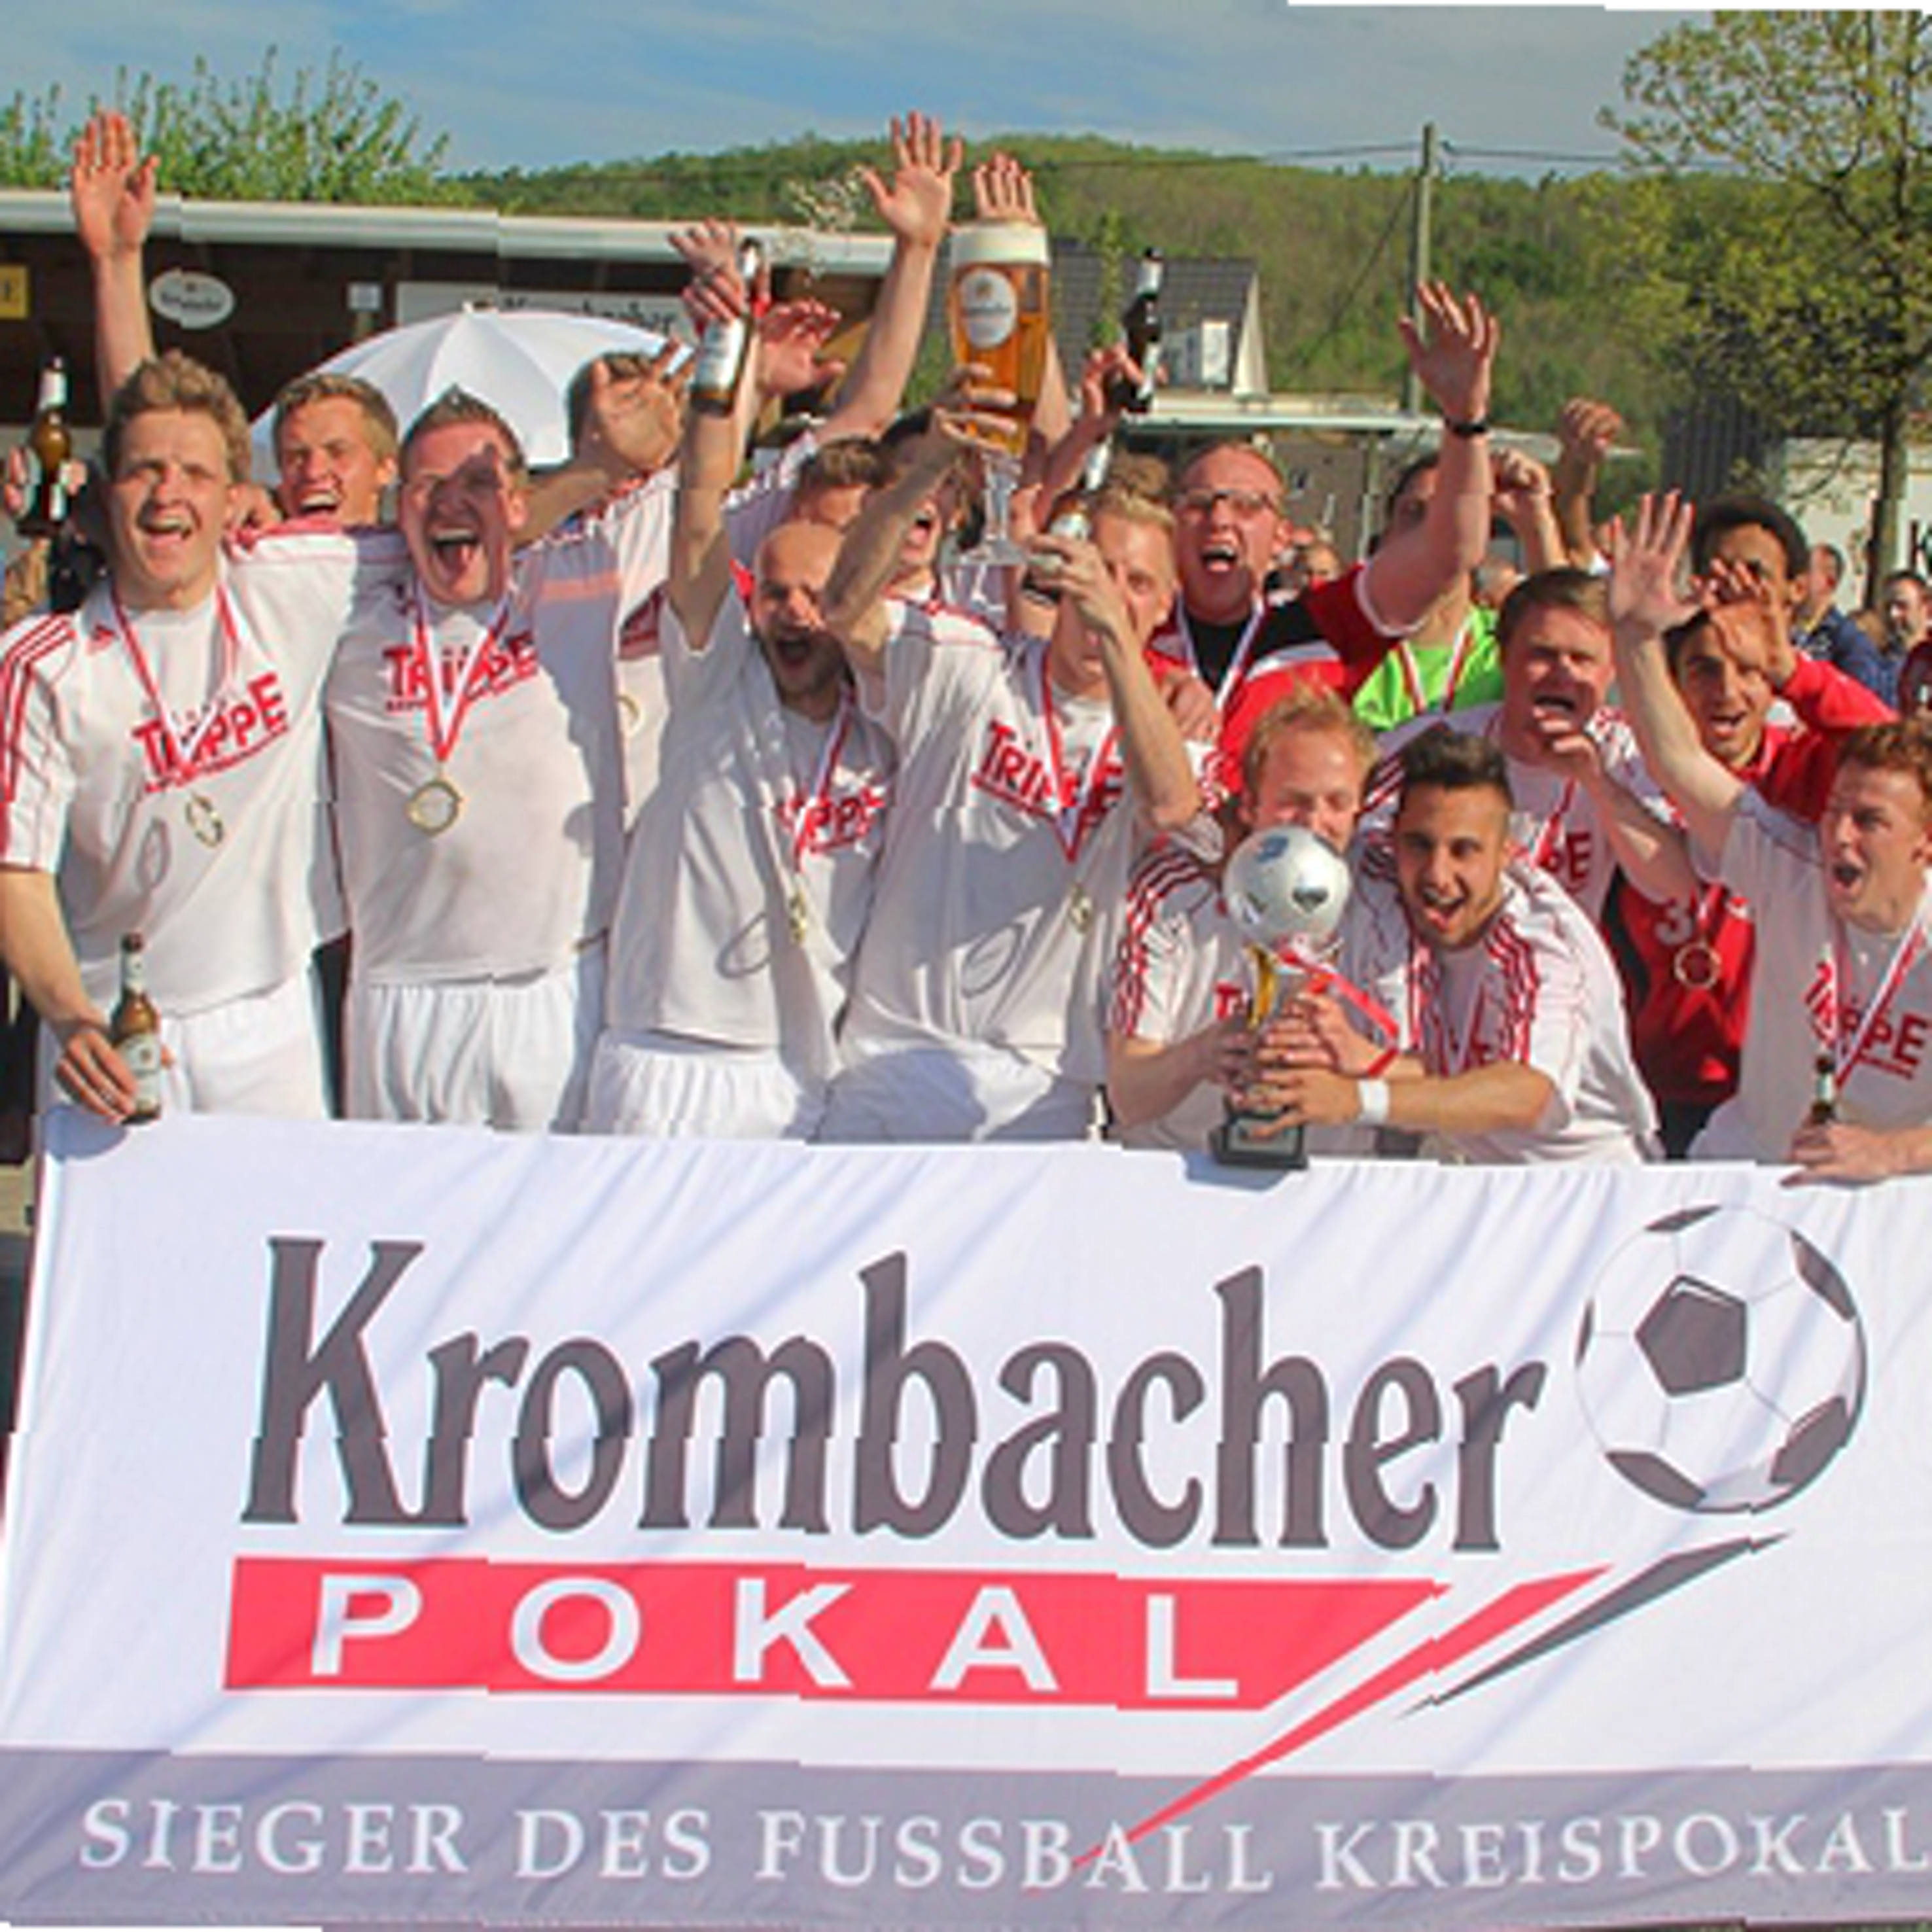 Finaltag des Ü 32 Kleinfeld-Krombacher-Pokals